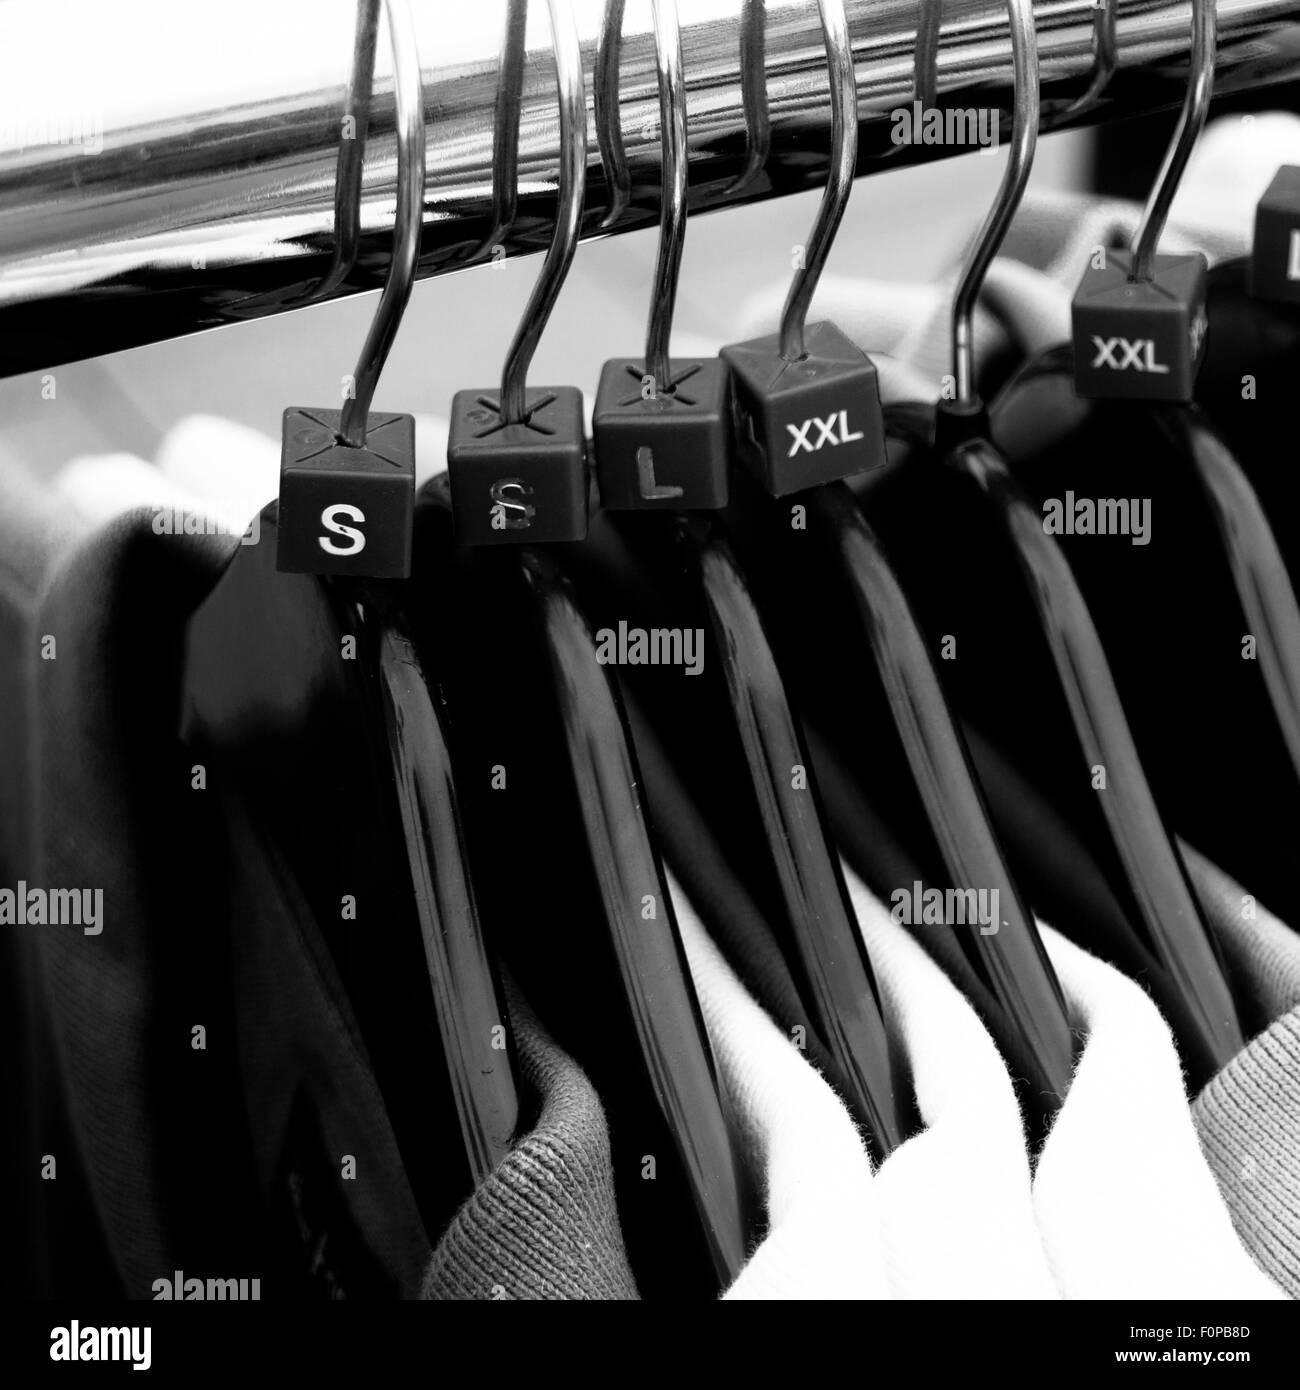 Men`s clothes sizes on coat hangers - Stock Image